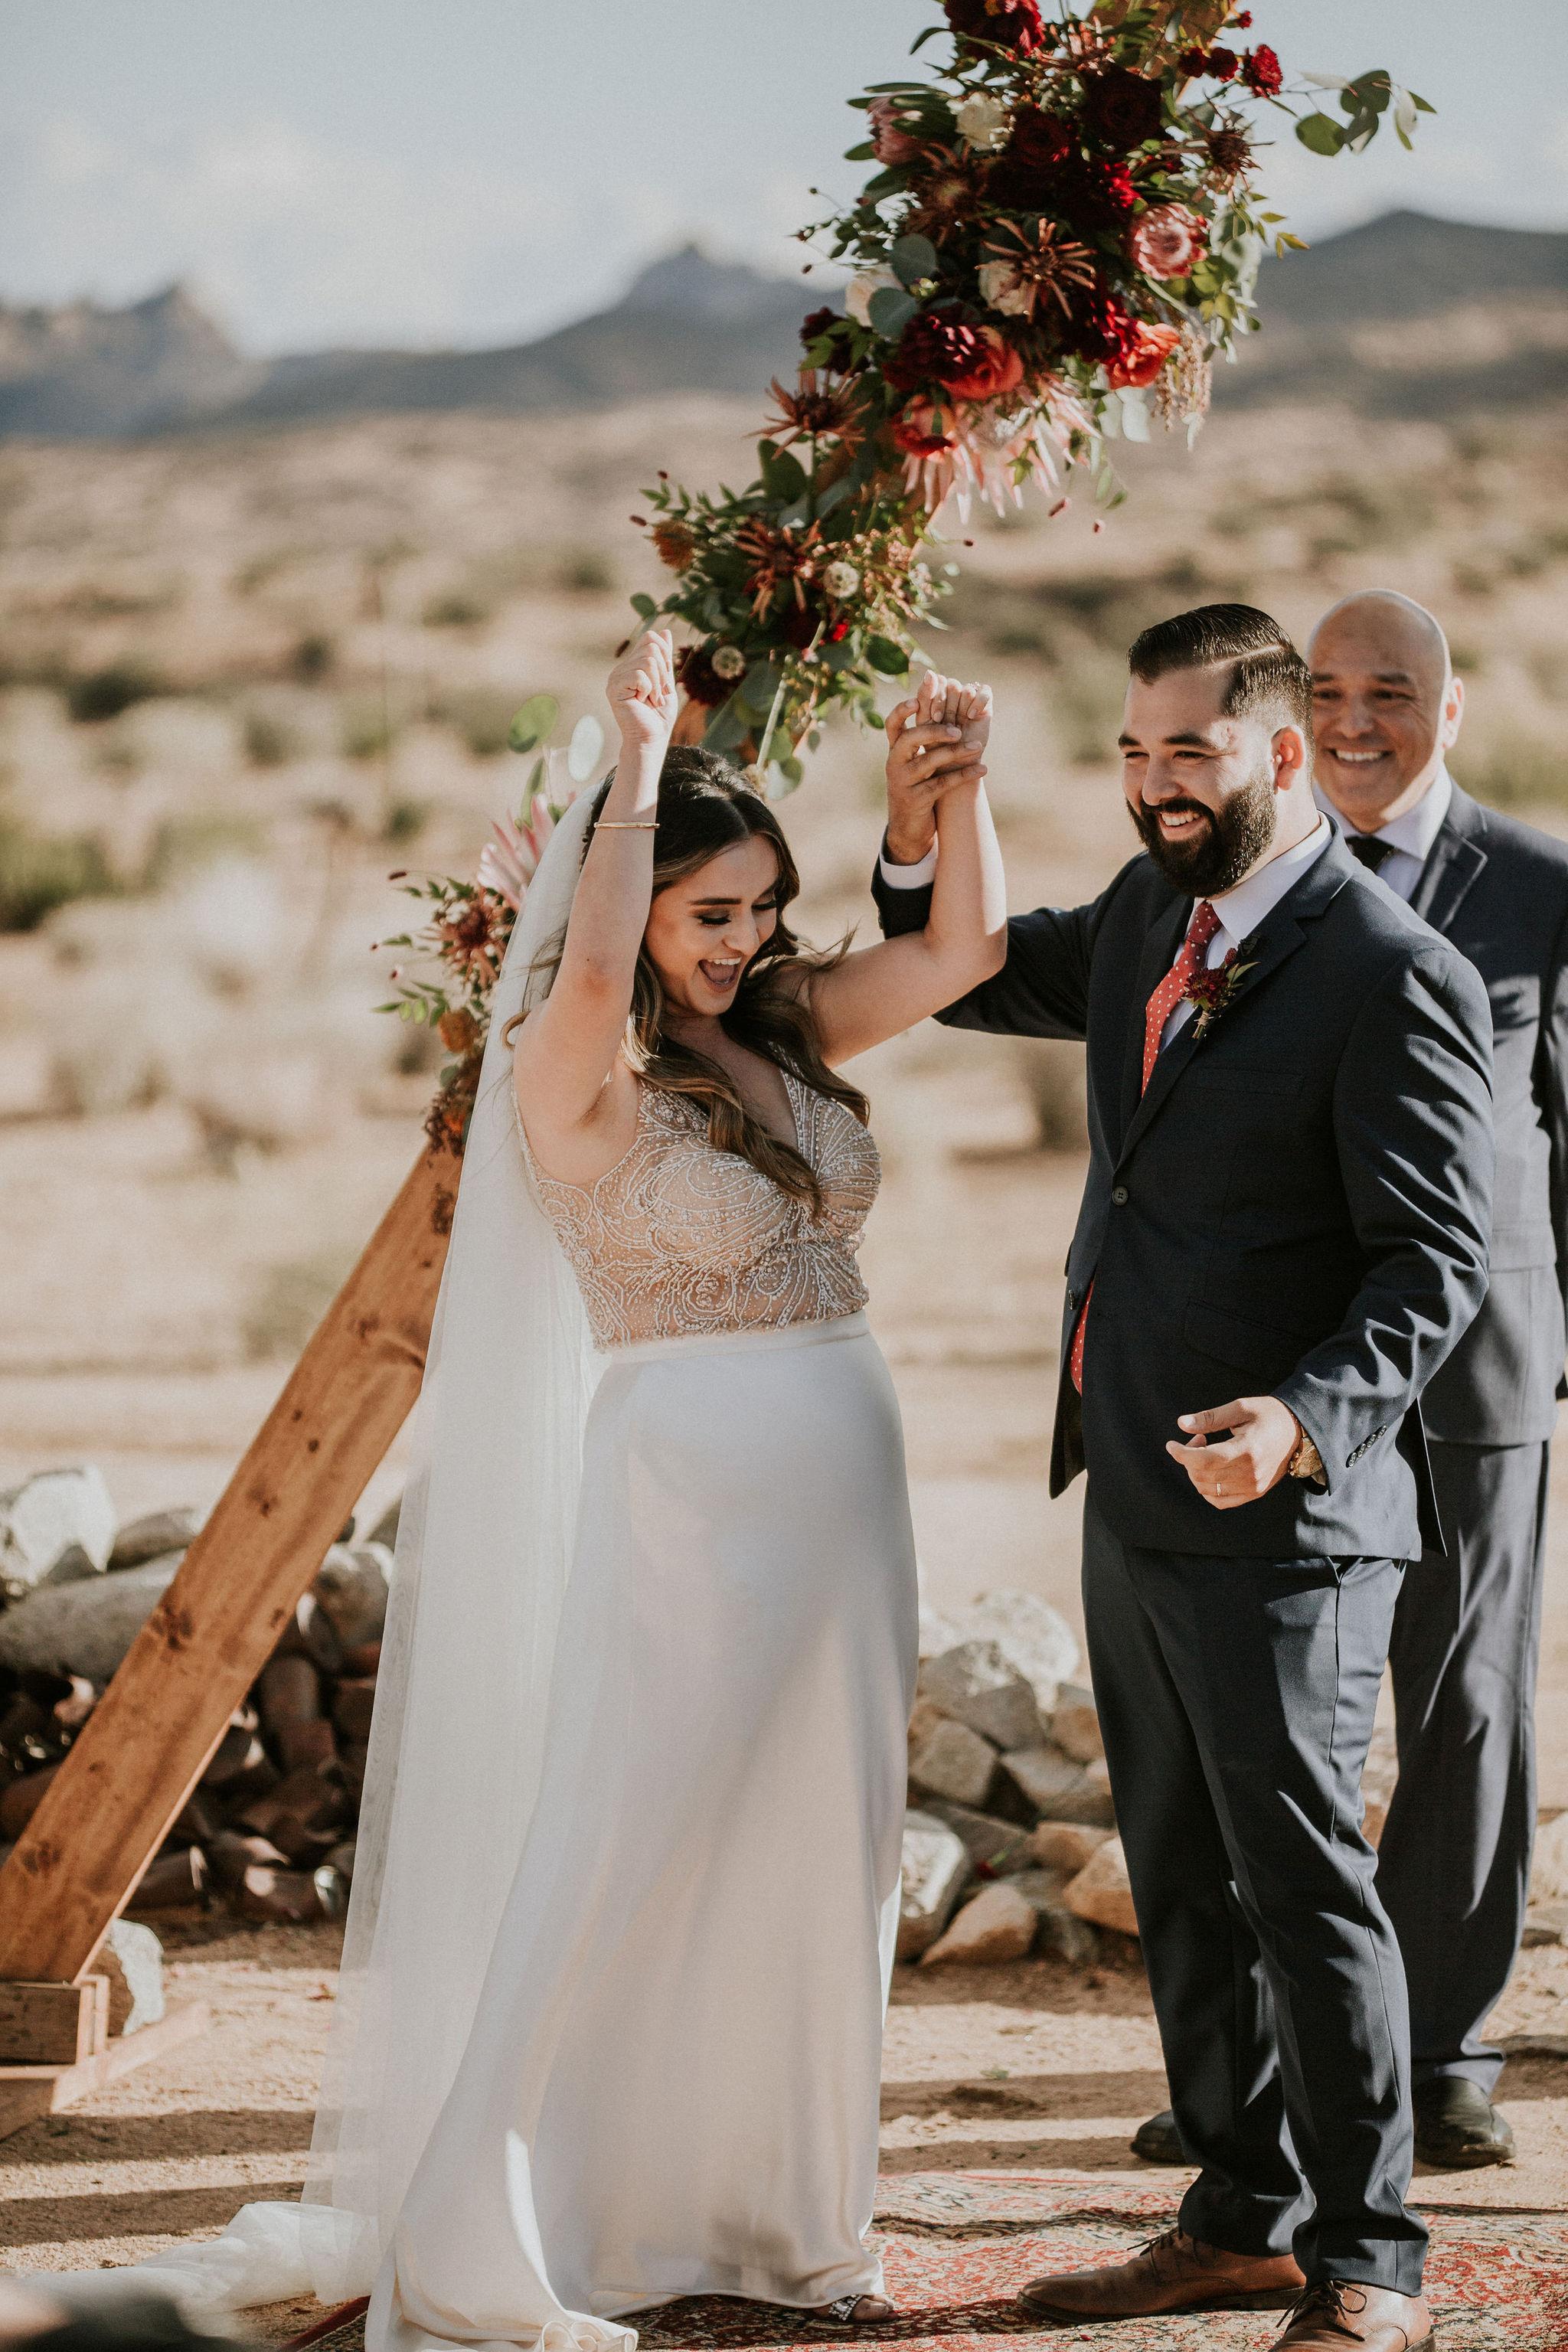 RimrockRanch-JoshuaTree-Wedding-Jami-Laree-402.jpg